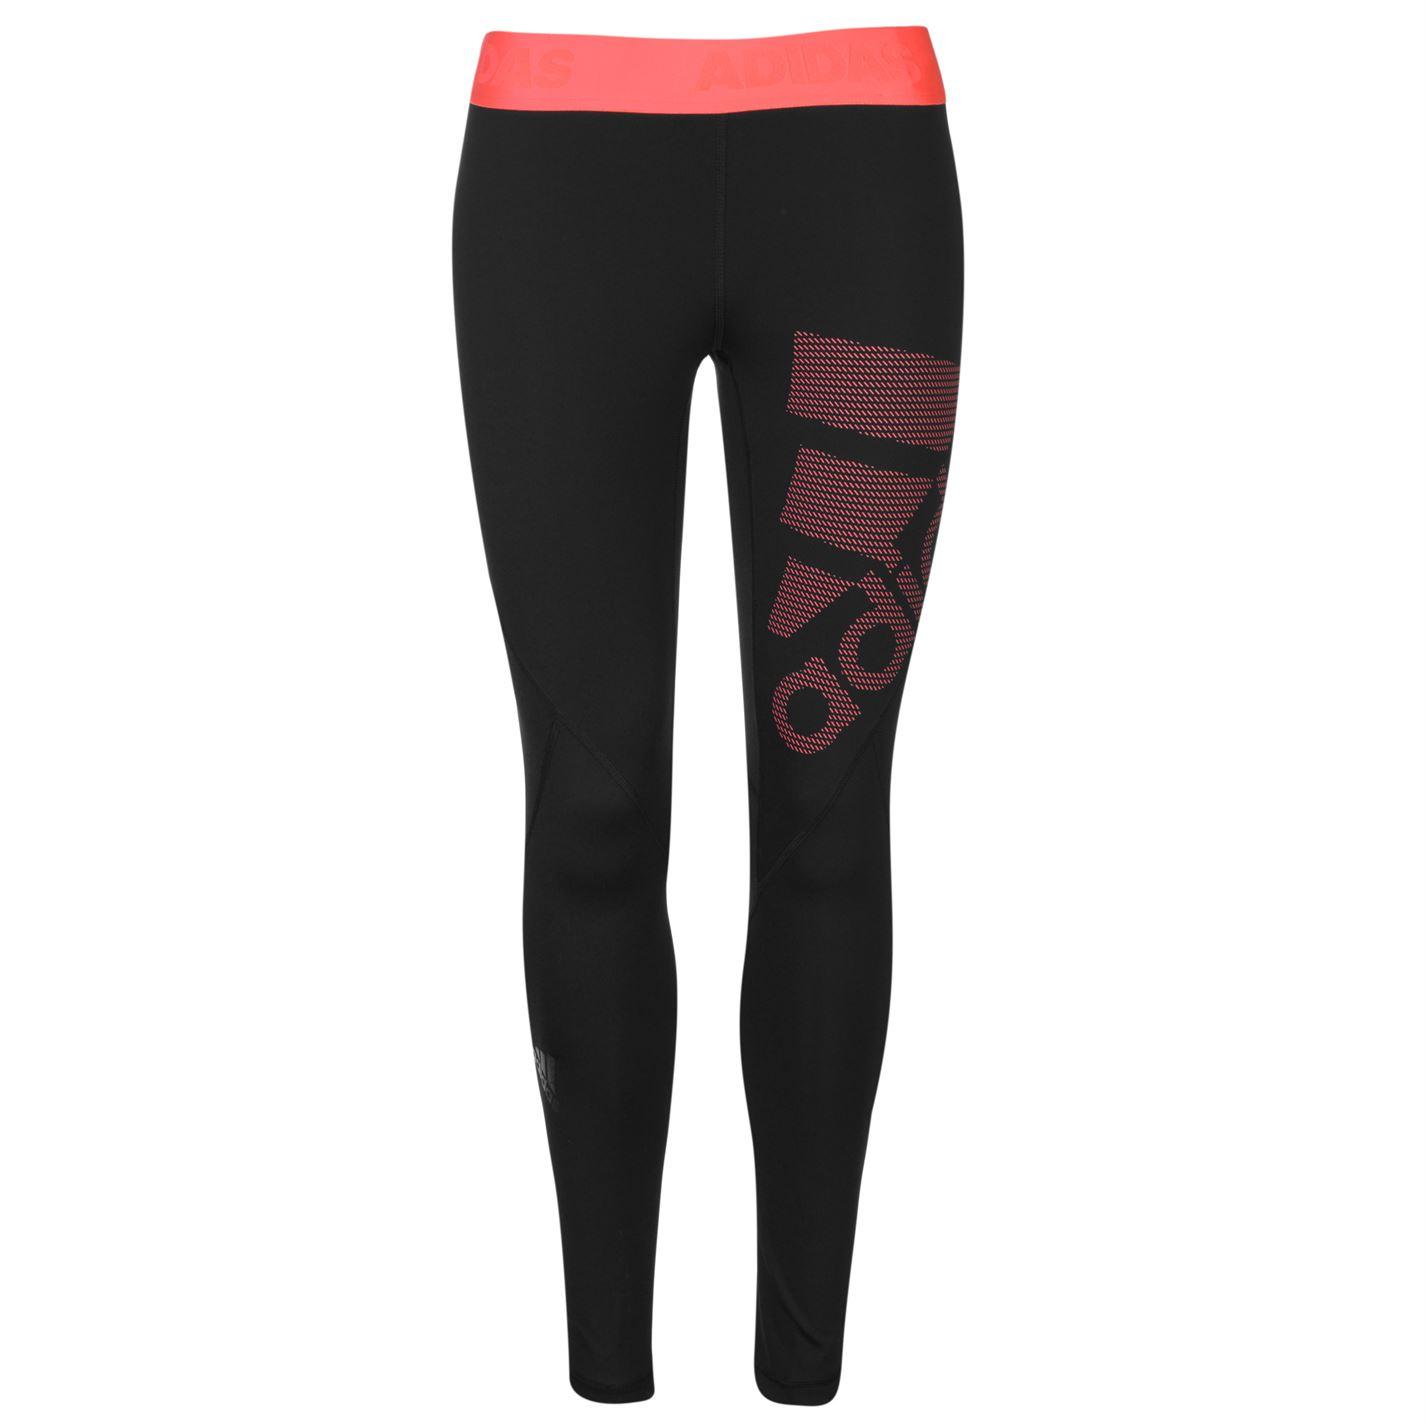 Adidas Womens Leg Logo Performance Tights